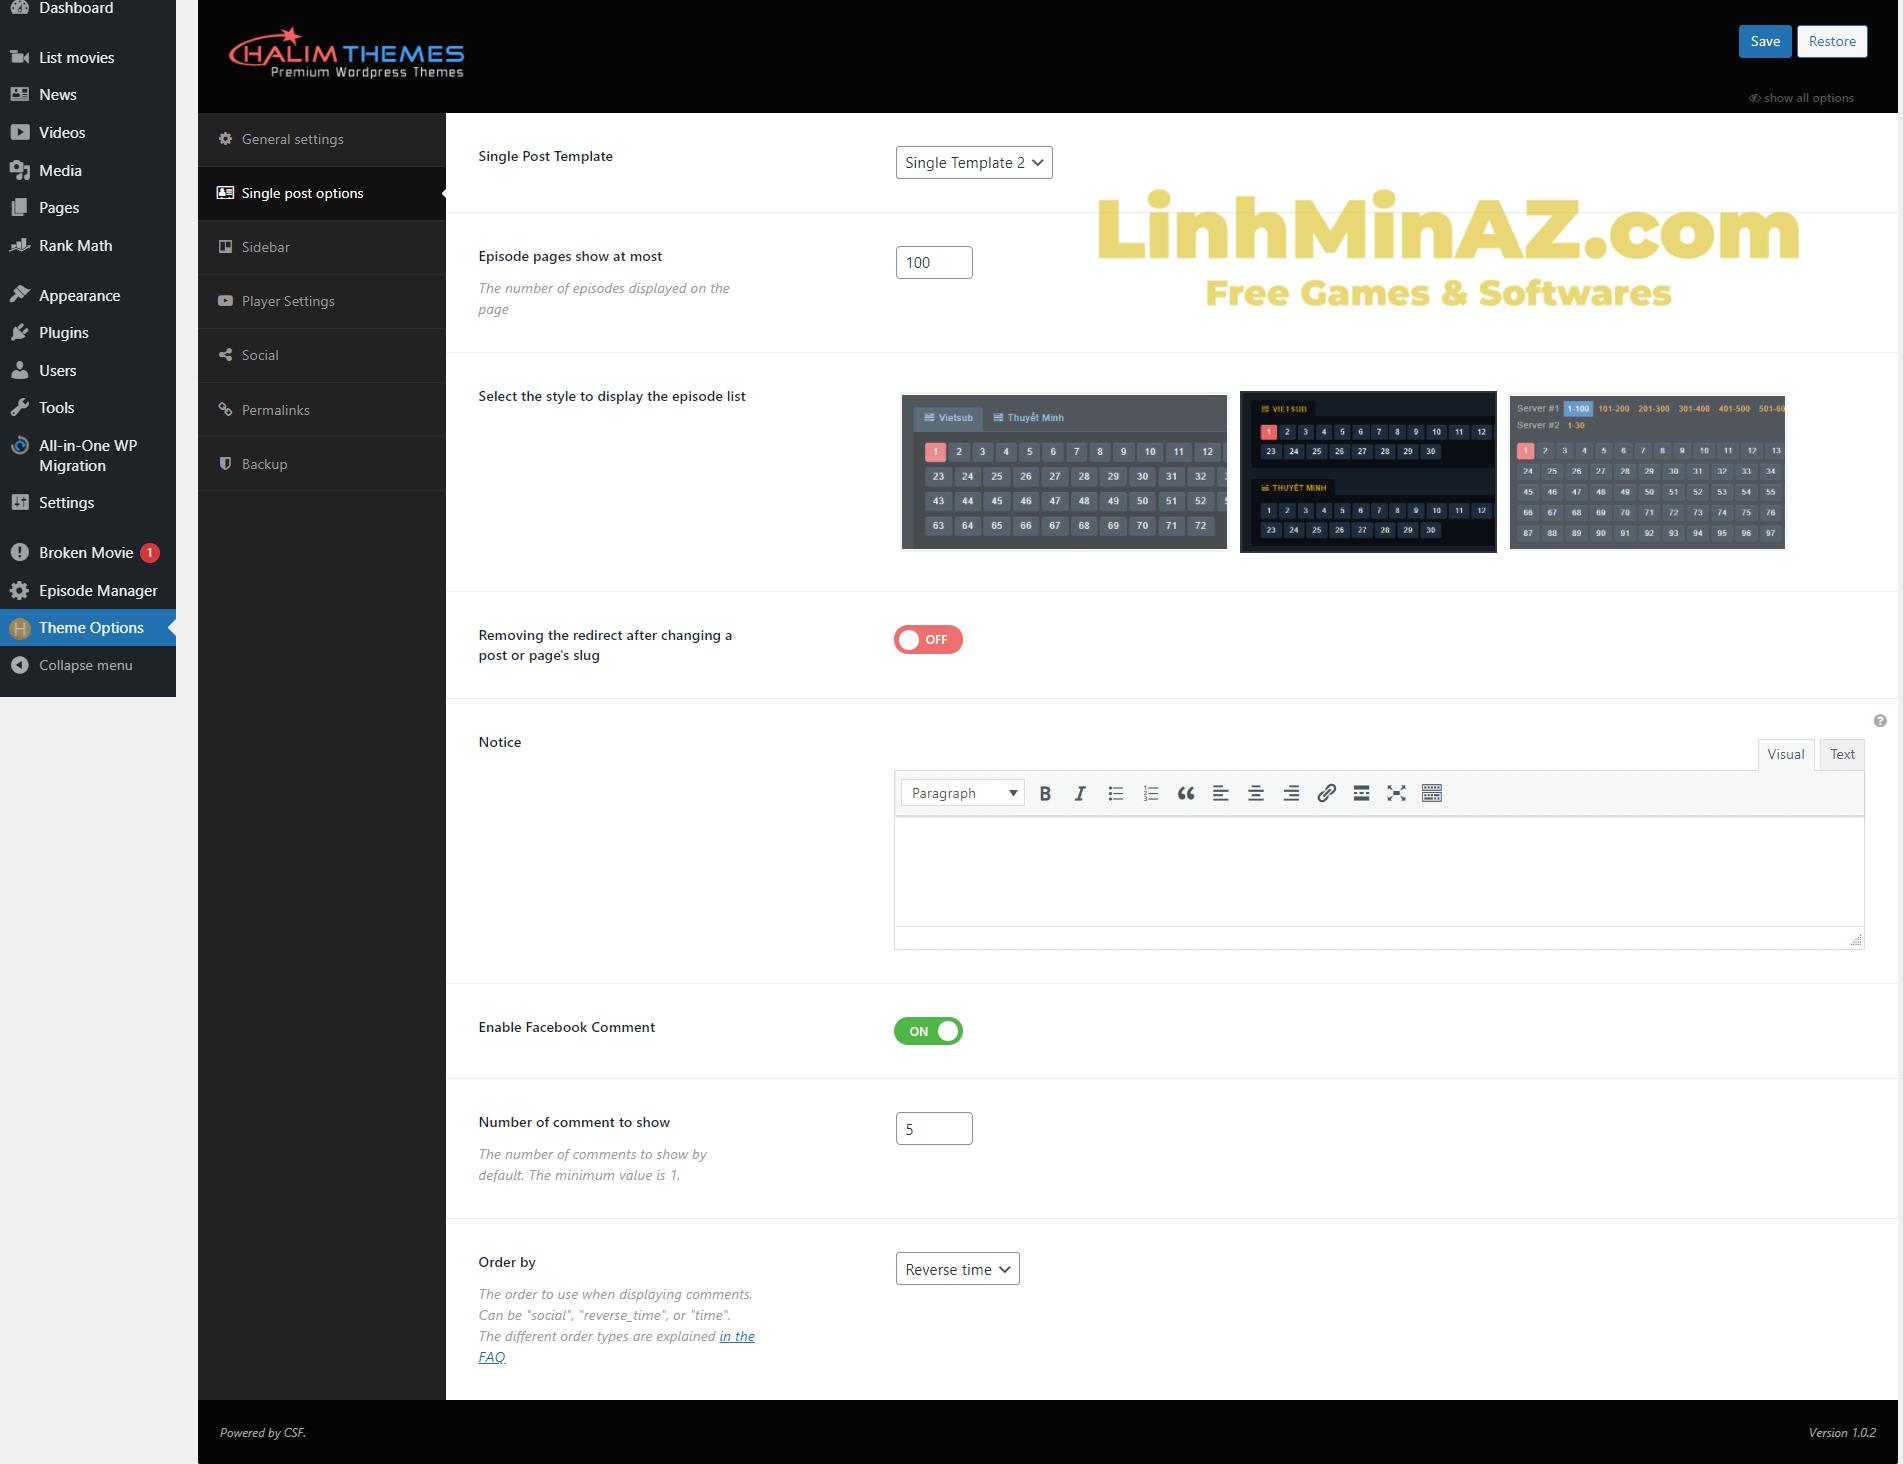 LINHMINAZ.COM HALIM NULLED 5 - LINHMINAZ